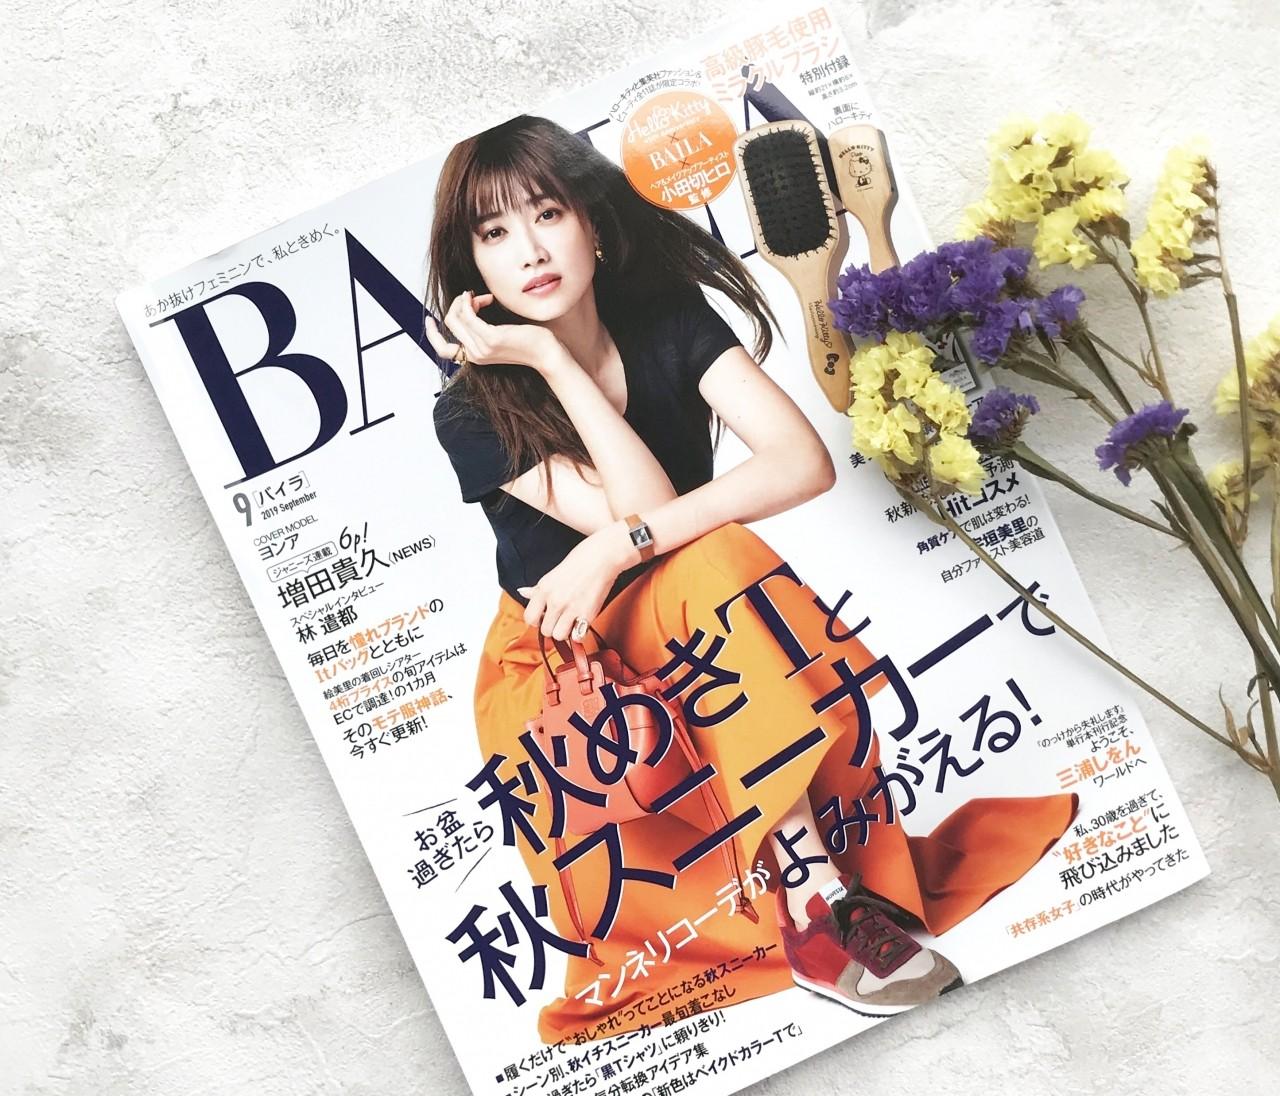 BAILA9月号発売!今月の読みどころは?